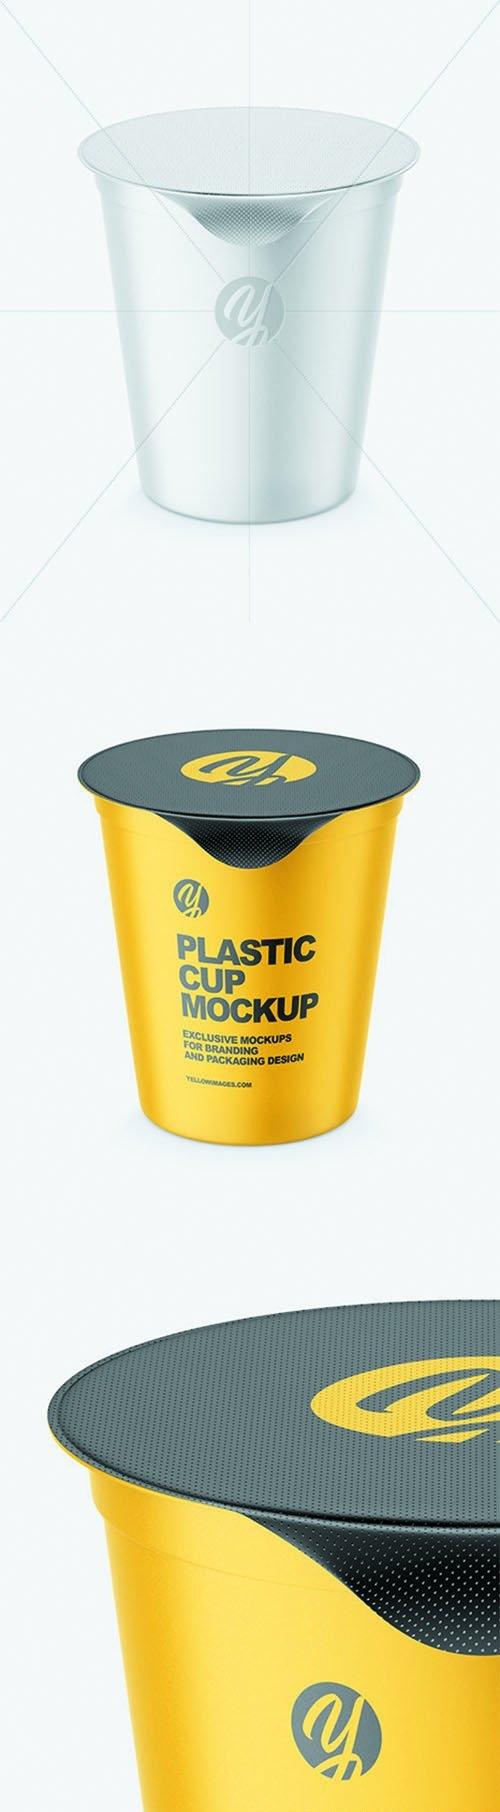 Plastic Cup Mockup 68423